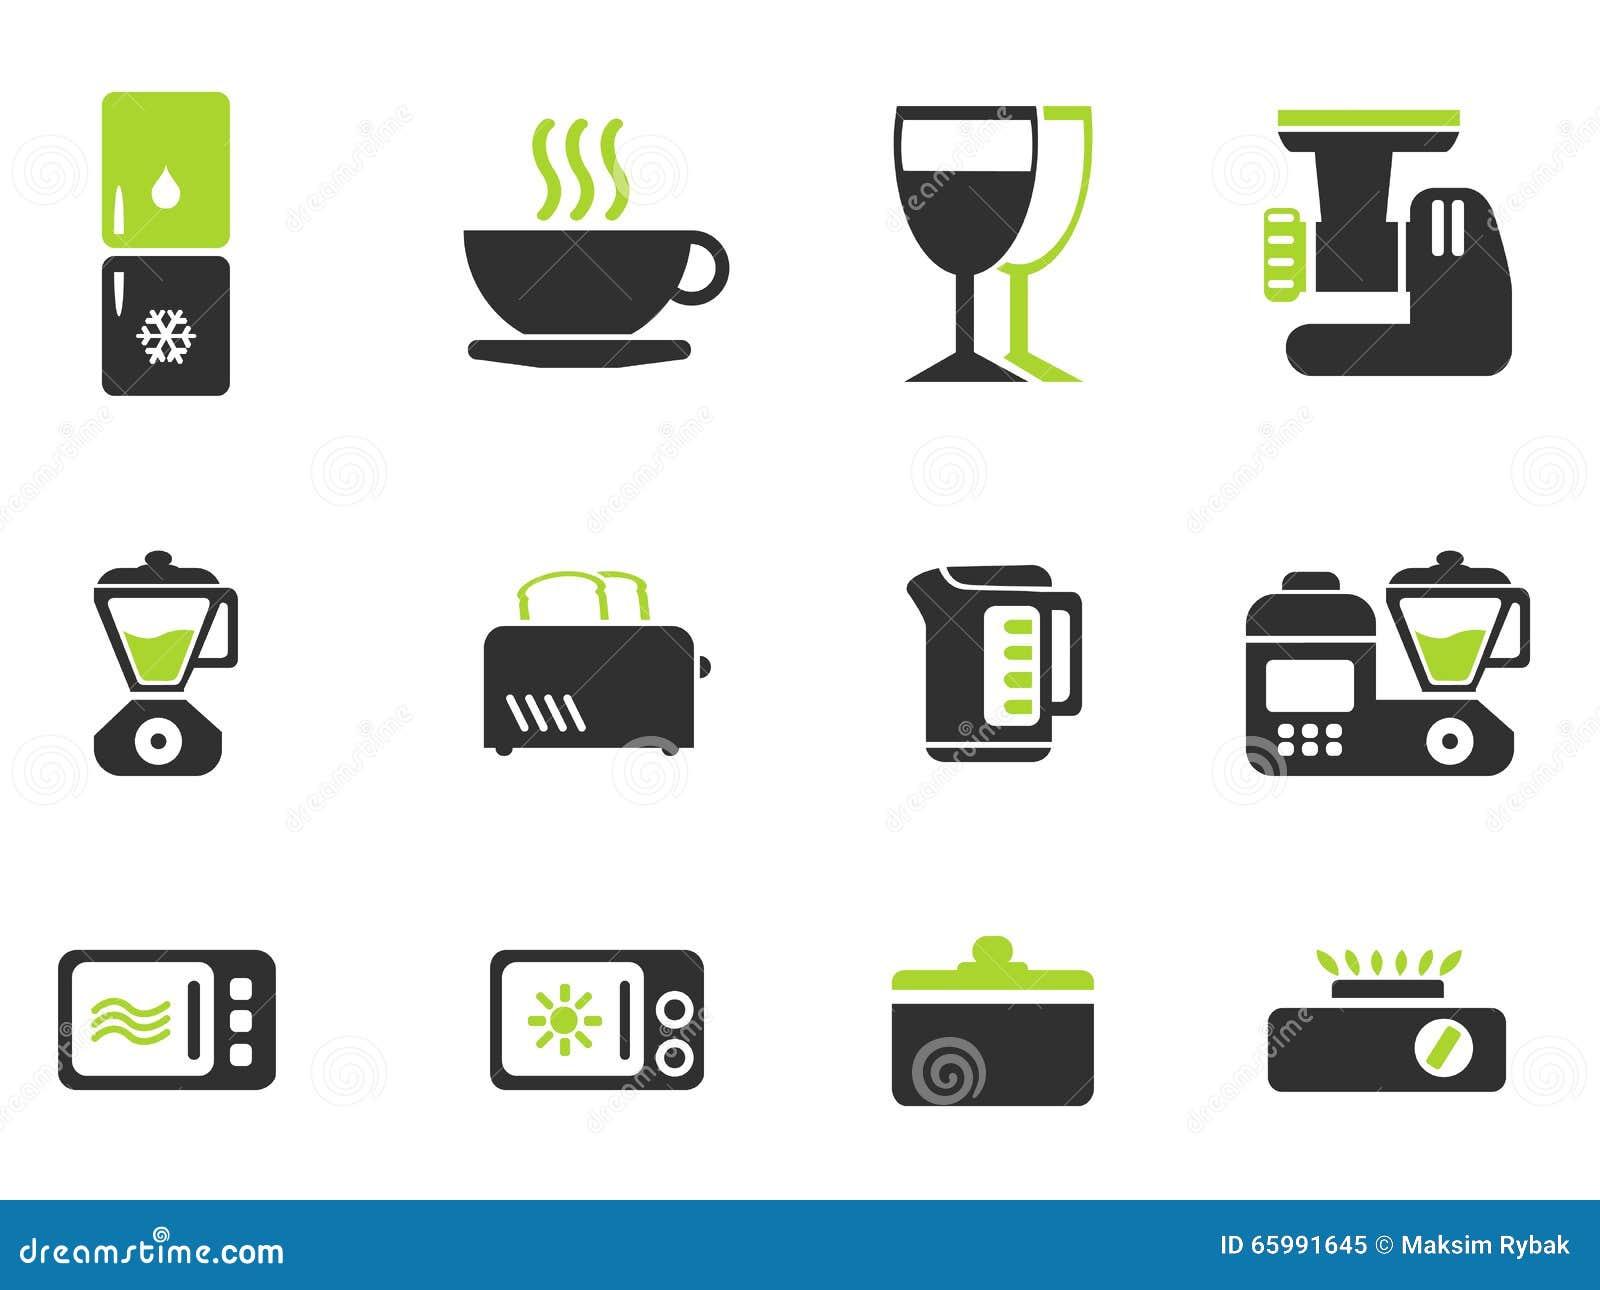 Symbols And Amazing Kitchen Design Centre Lavender Hill Images kitchen